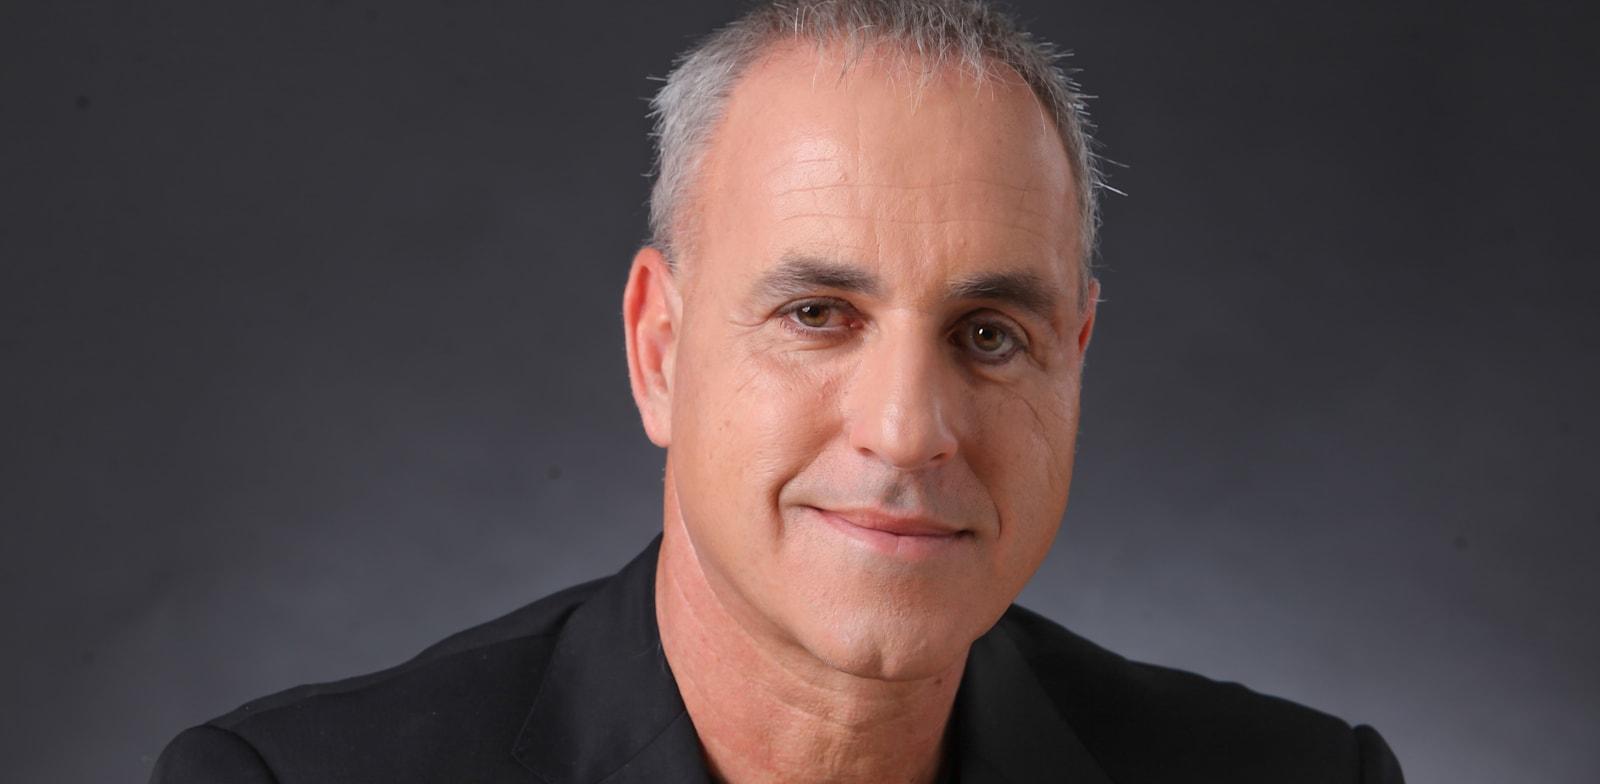 ערן וולף, מנכ''ל מימון ישיר. / צילום: יח''צ